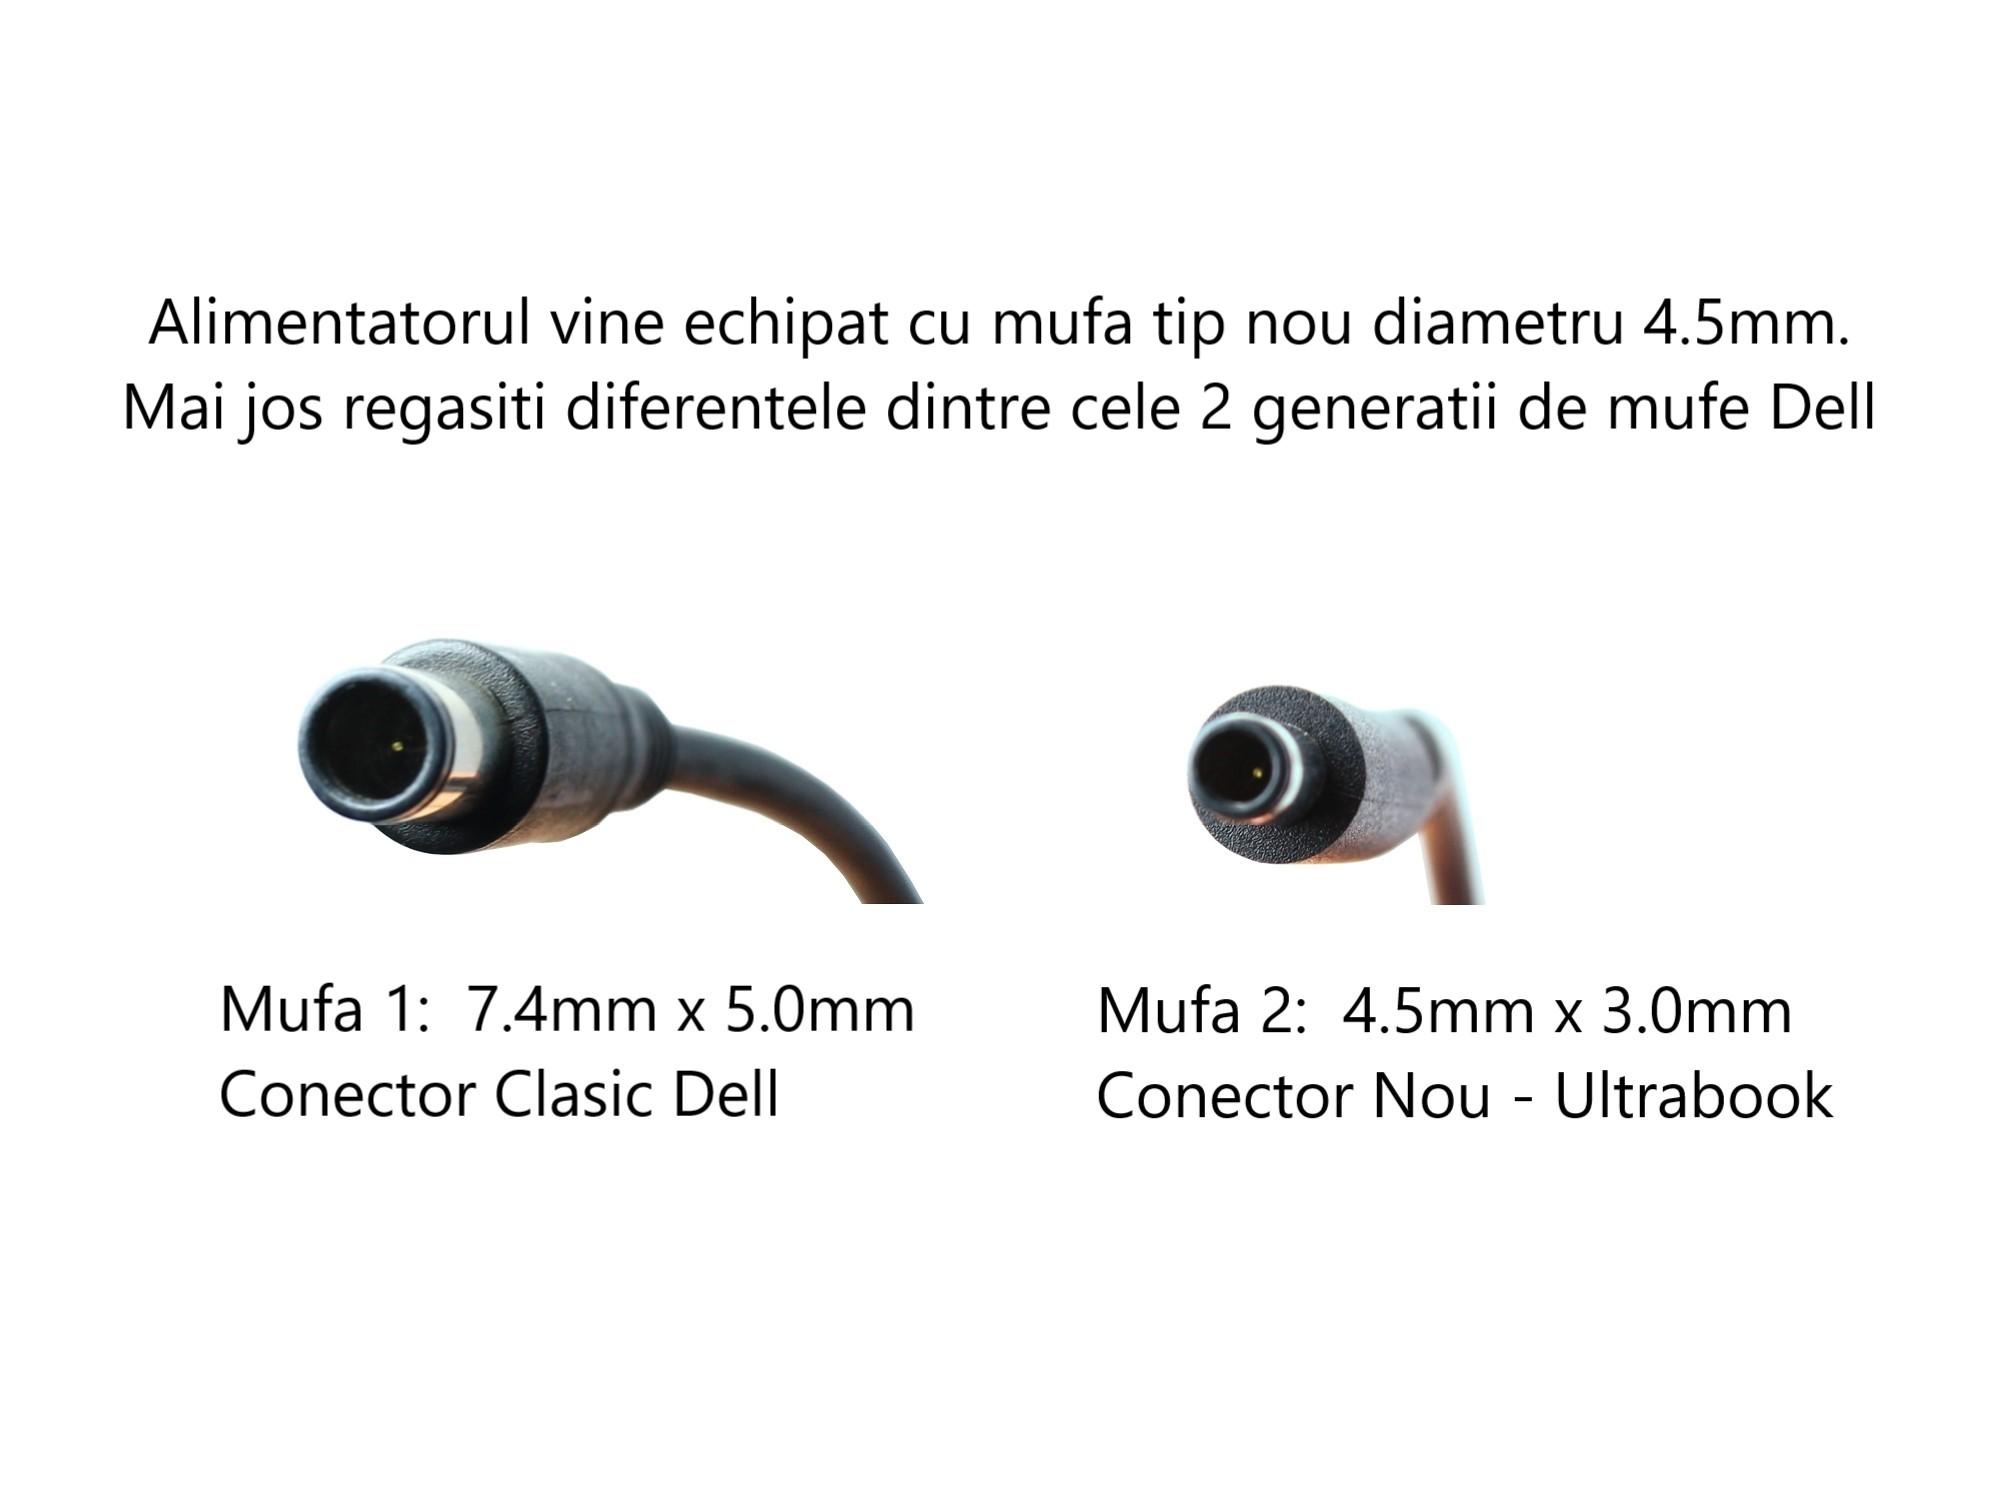 Incarcator original laptop Dell Precision 5540, 15 5520, 15 5510, 15 5530 130W, varianta clasica